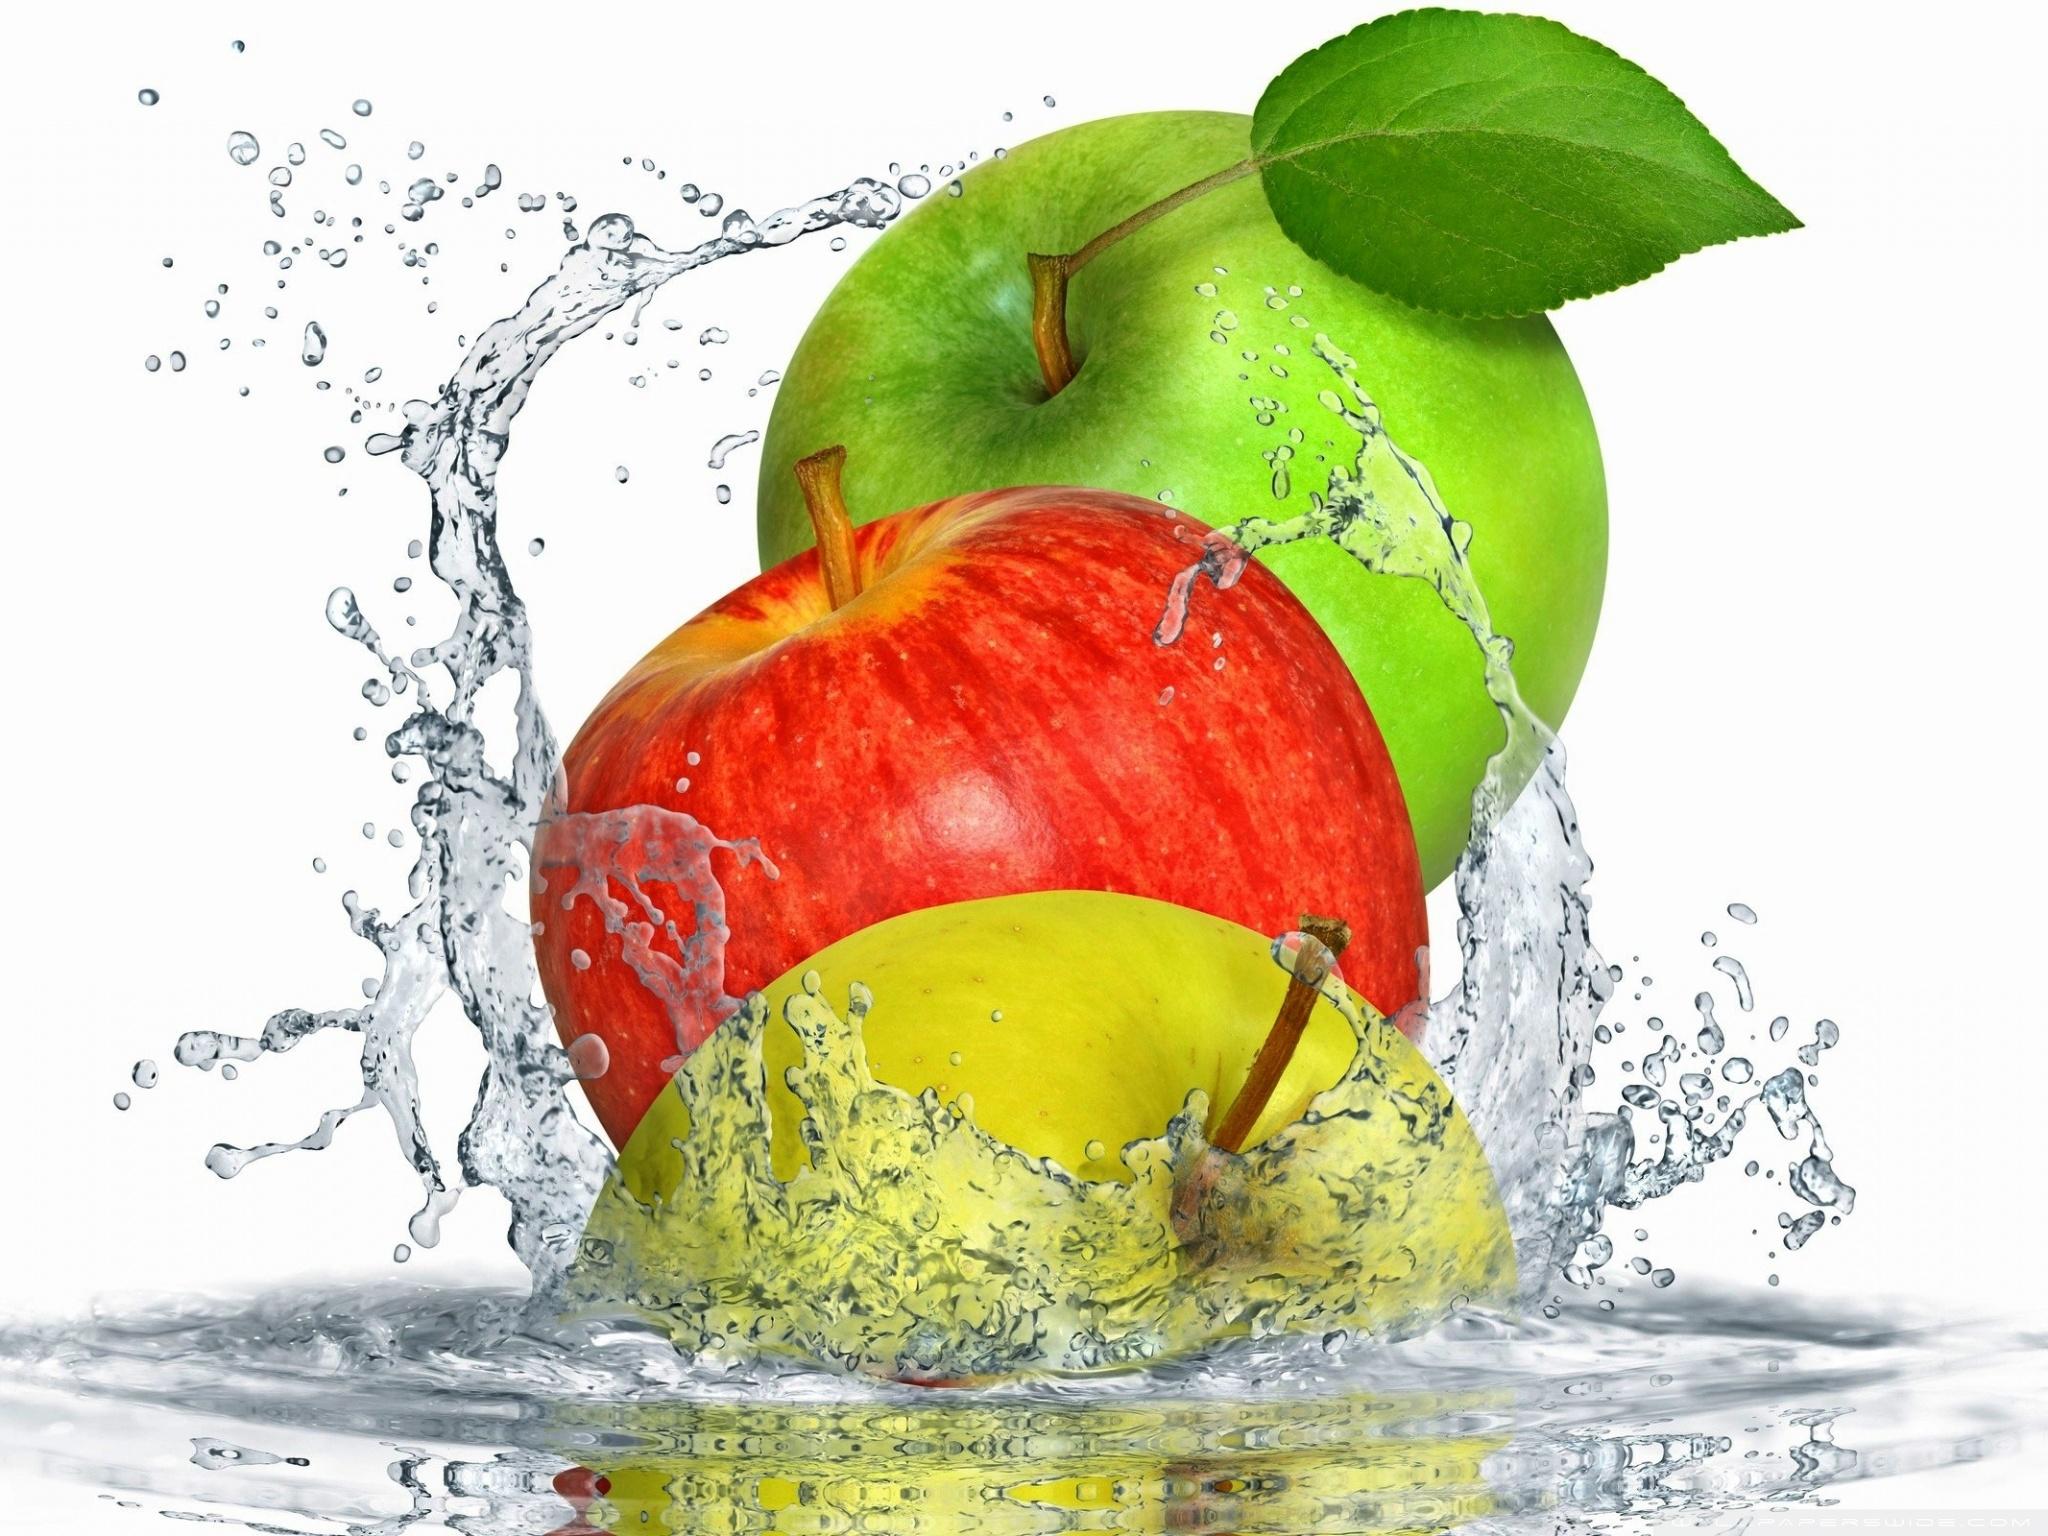 Water Splash Apple